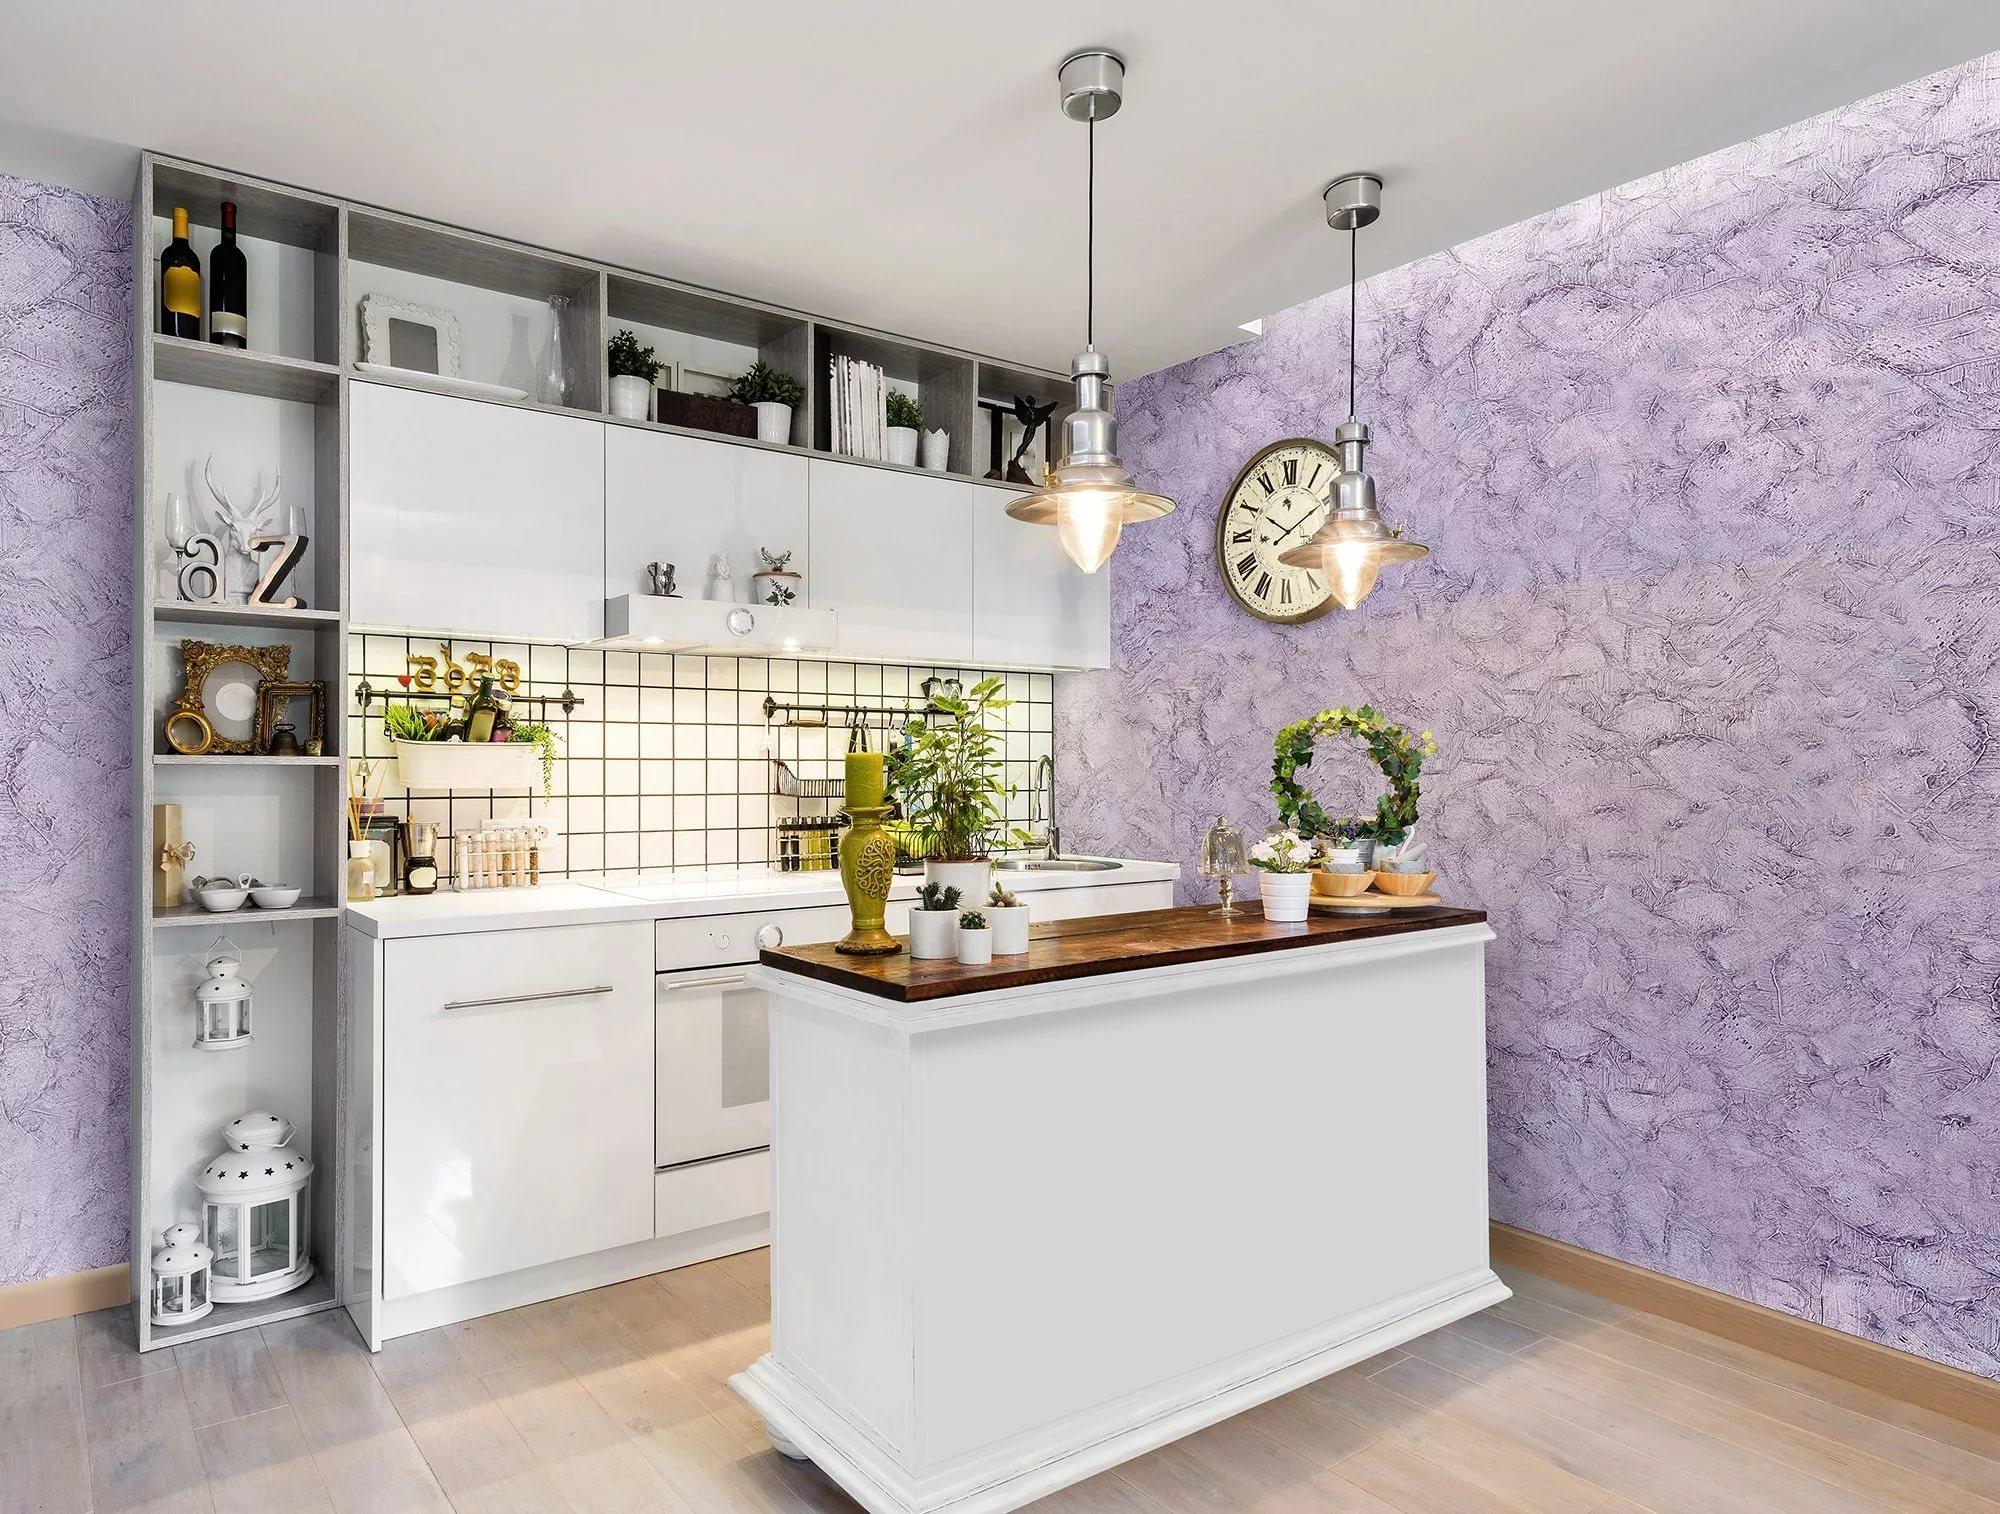 Фото жидких обоев на кухне